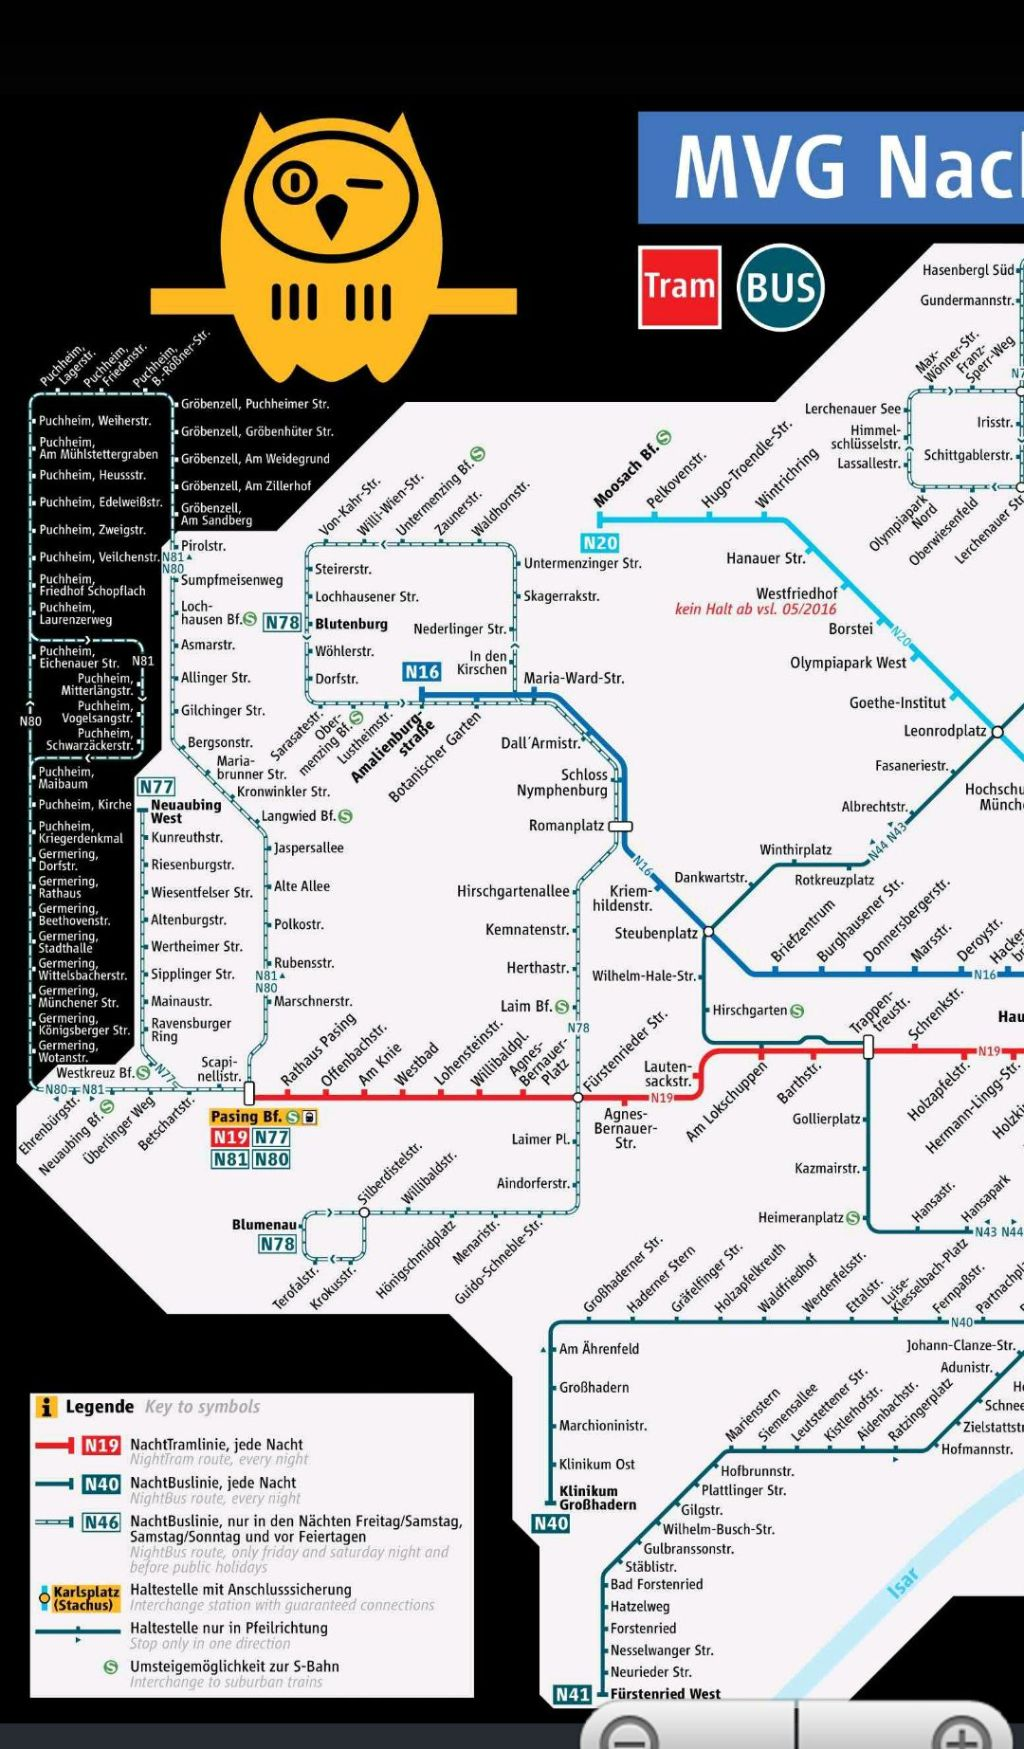 Mvg Fahrinfo München Münchner Verkehrsgesellschaft Mbh